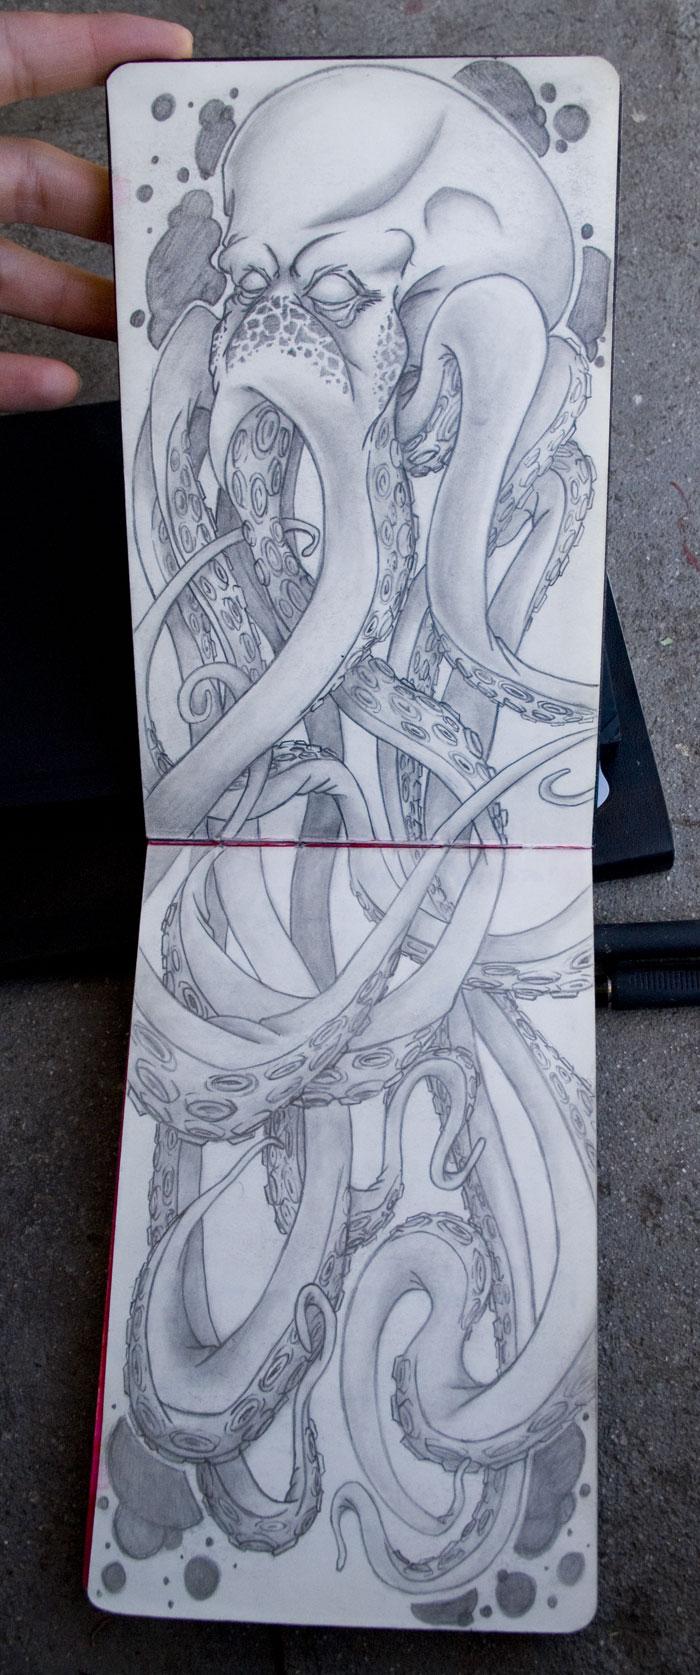 vertOctopus_02.jpg